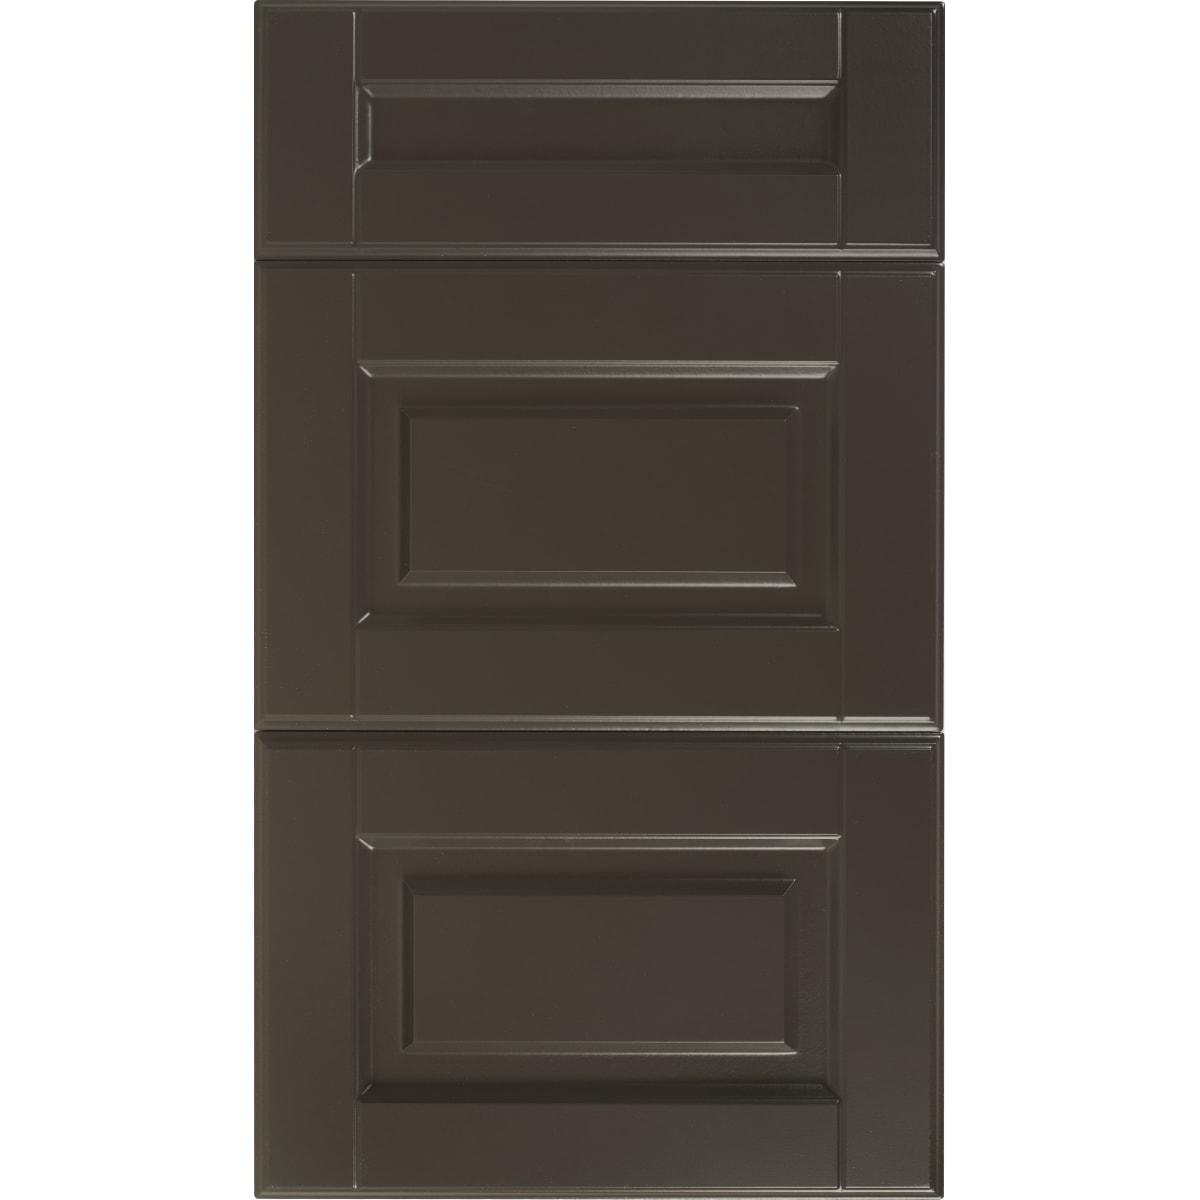 Двери для шкафа Delinia «Леда серая» 40x70 см, МДФ, цвет серый, 3 шт.